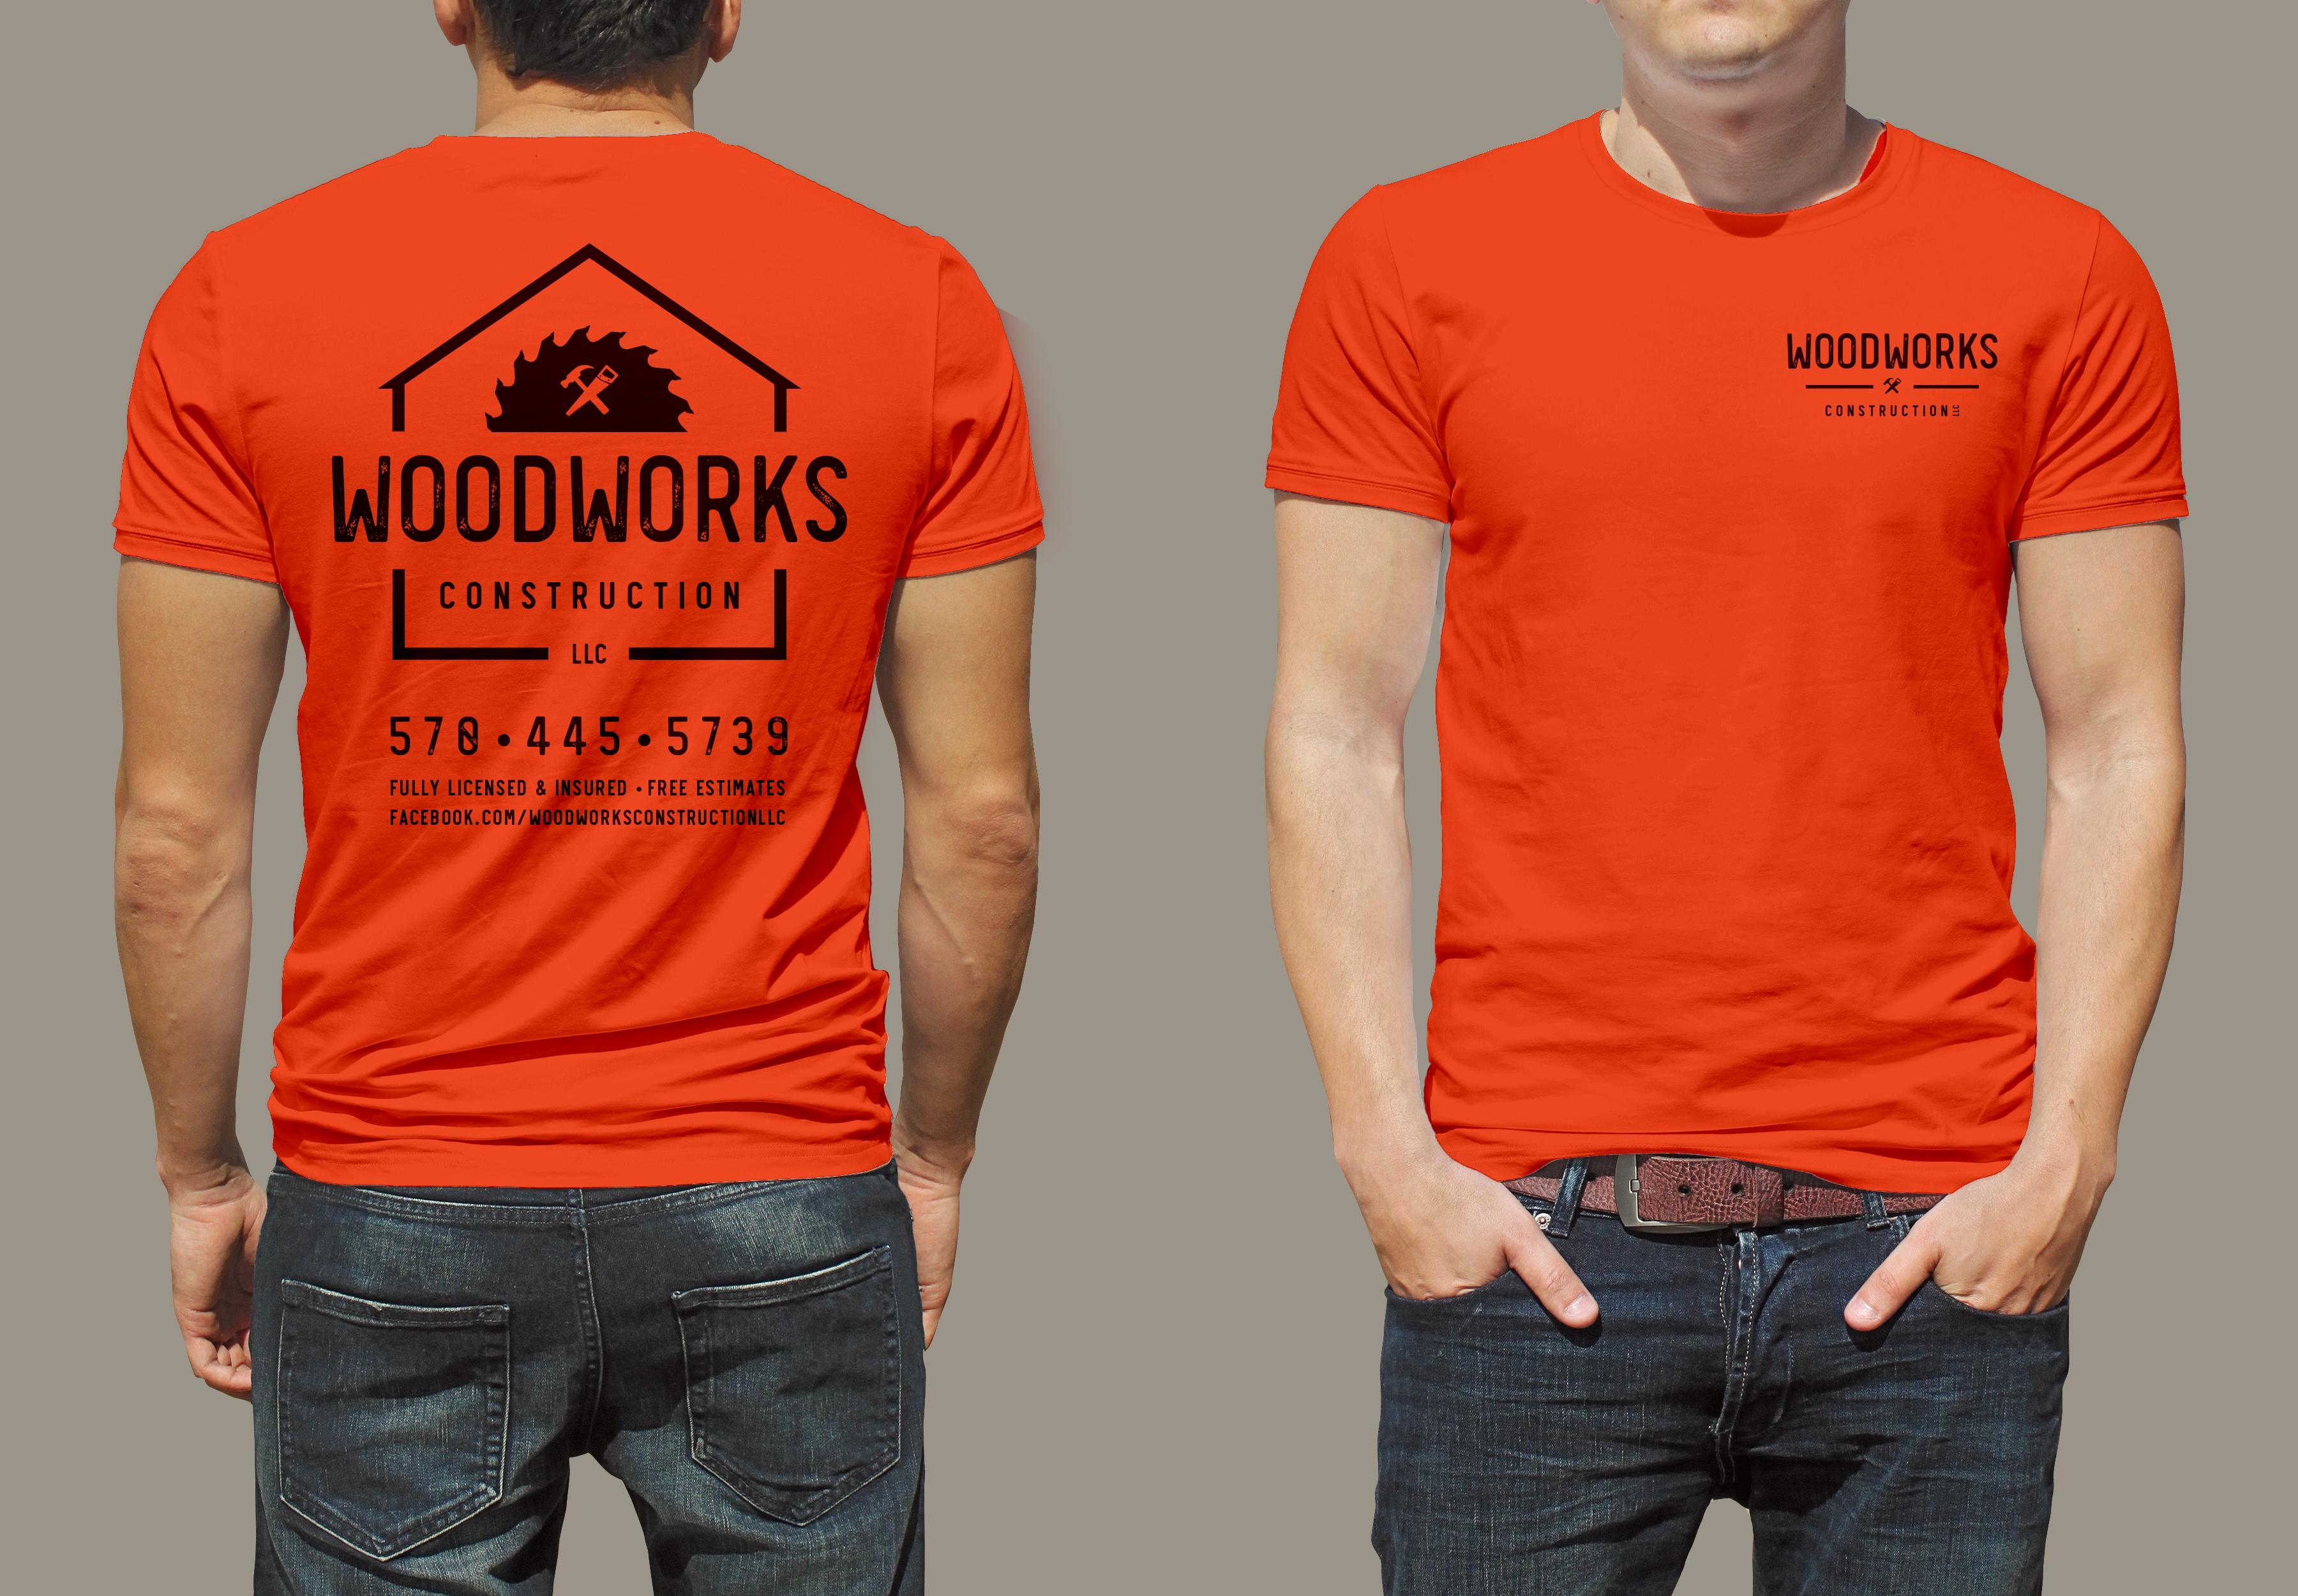 Woodworks T-Shirt Design